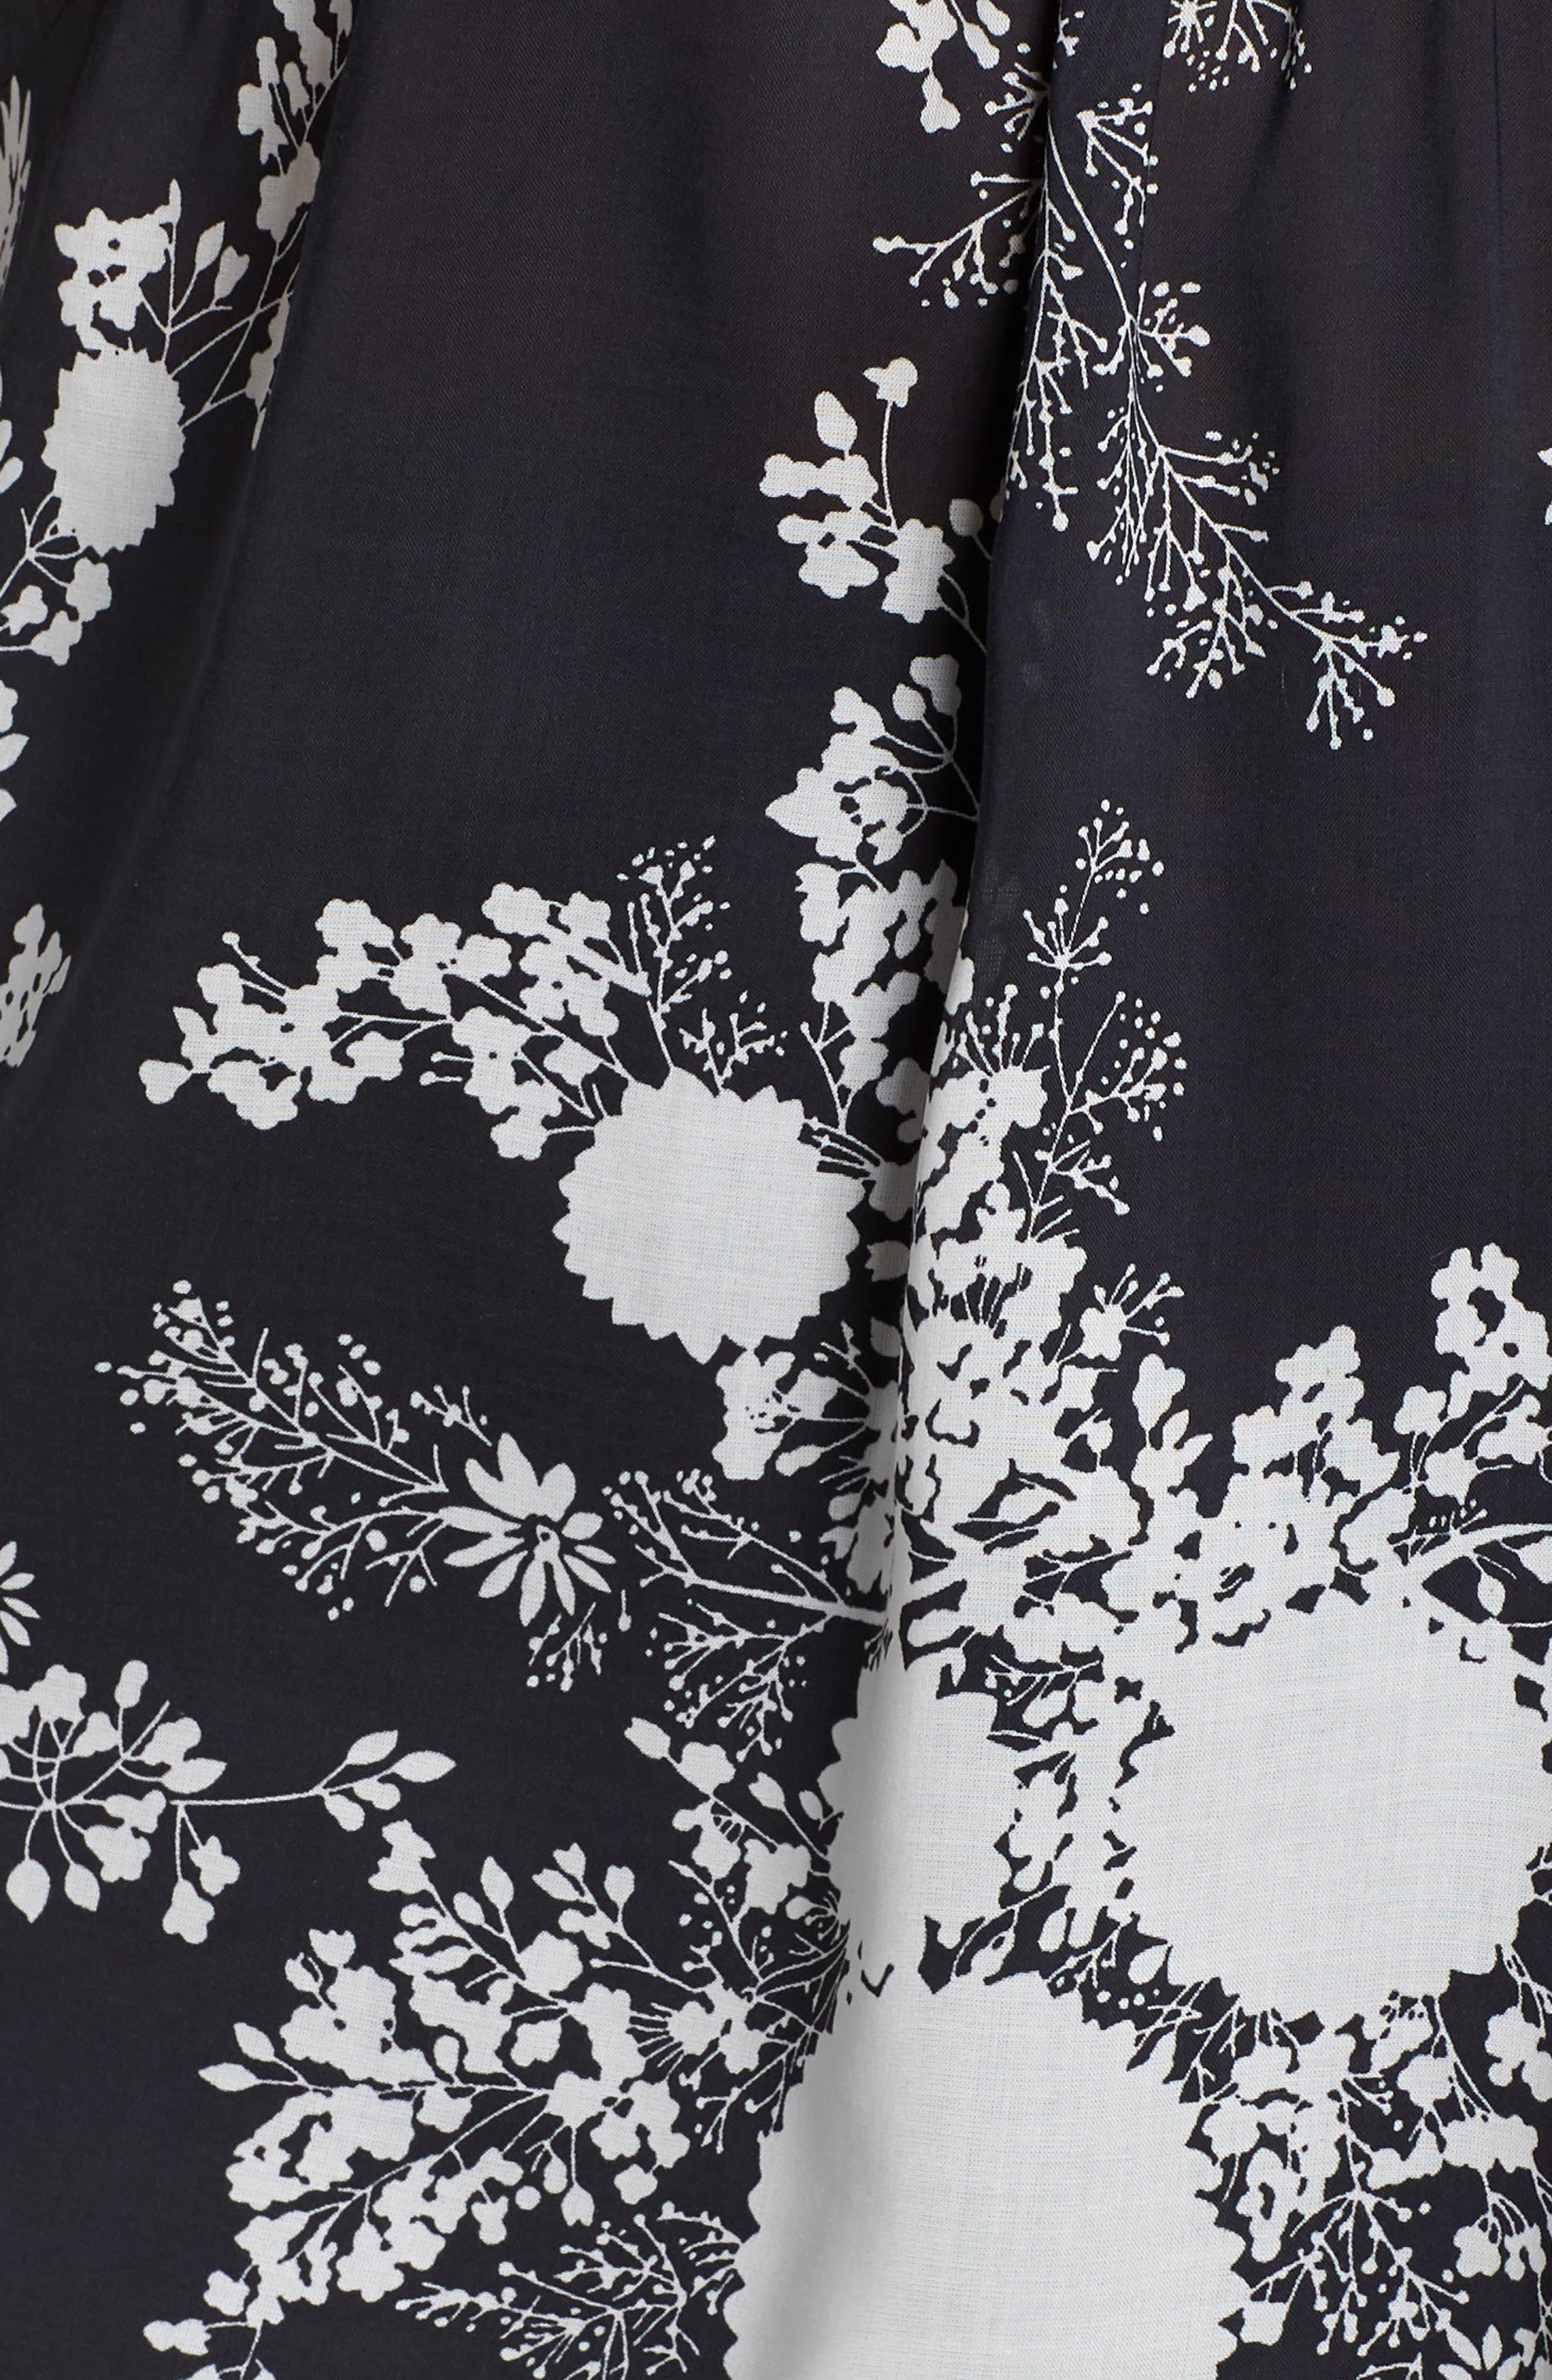 Floral Print Blouse,                             Alternate thumbnail 6, color,                             BLACK BLOOM FLORAL